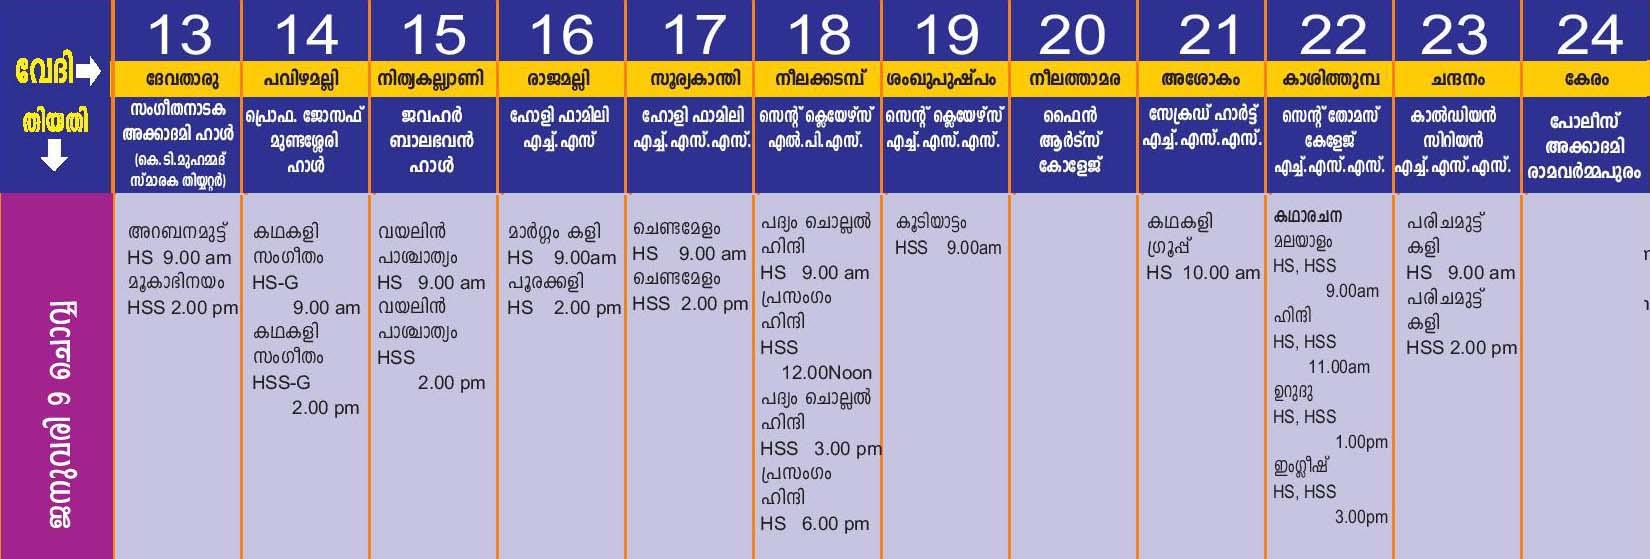 Kerala school kalolsavam 2018 Thrissur schedule programme chart 2 image